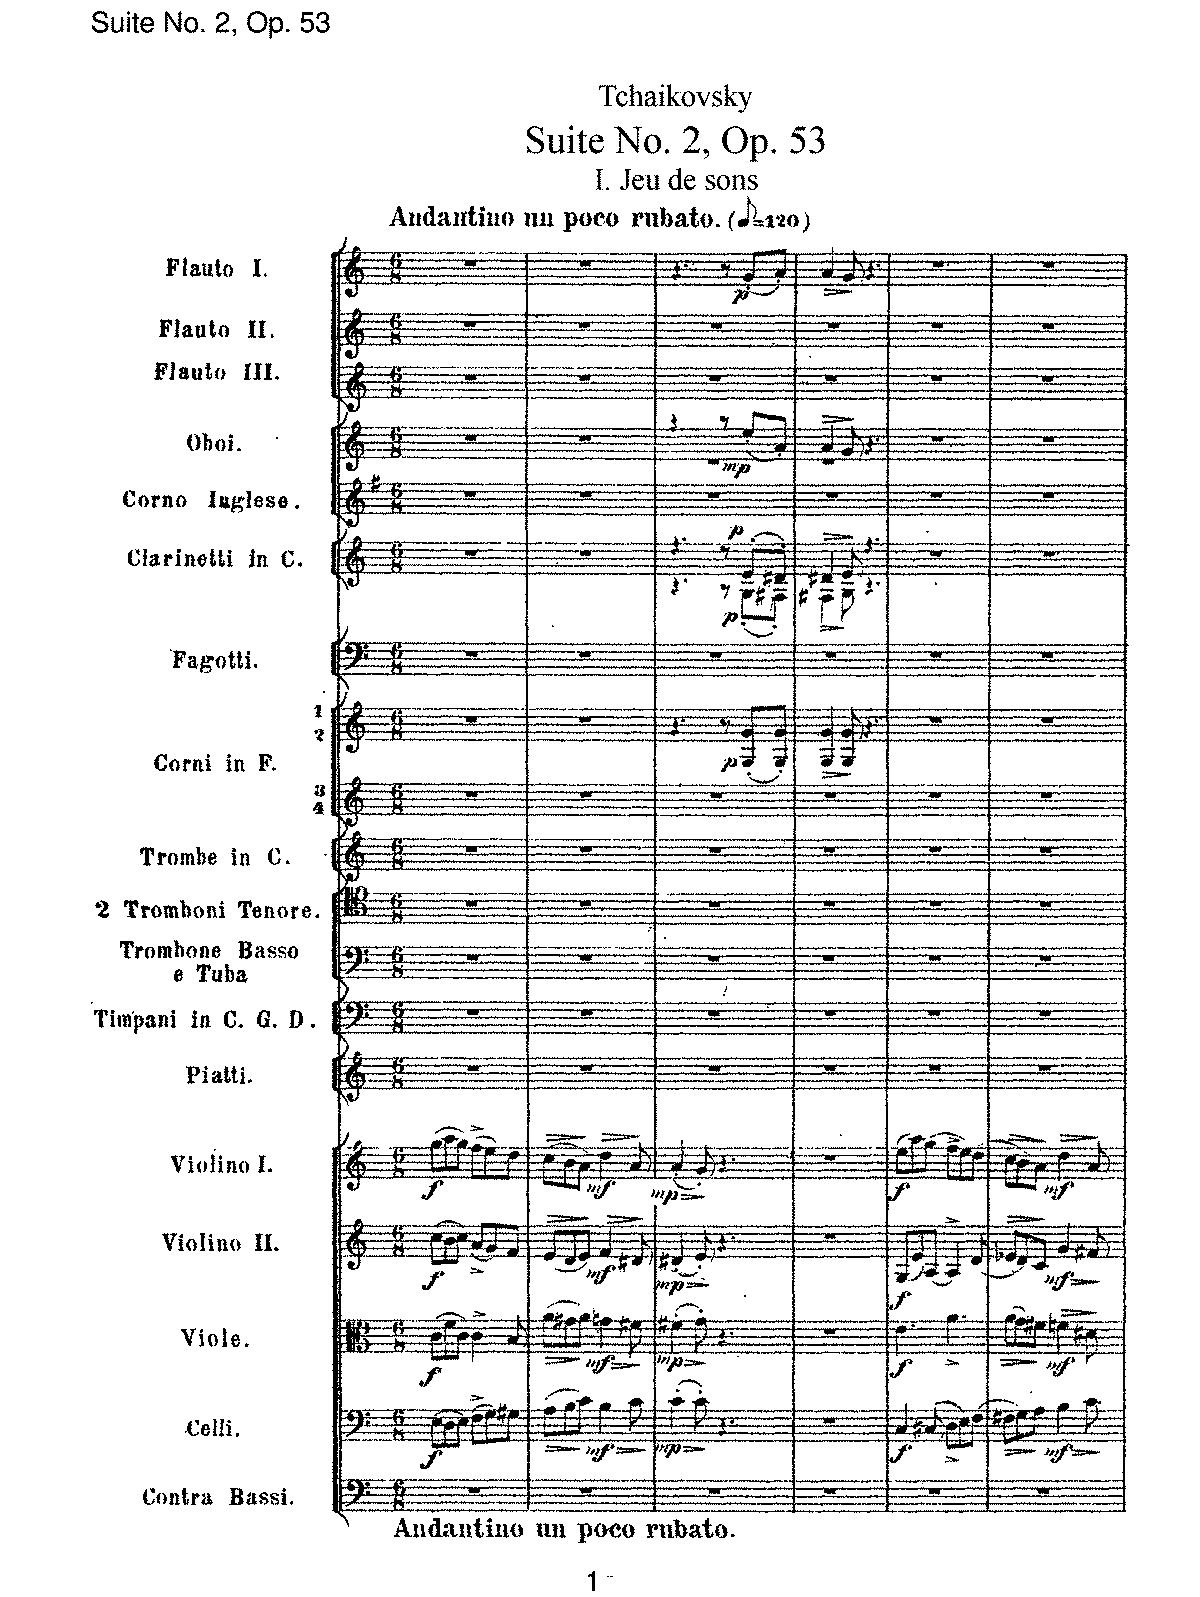 Suite No 2, Op 53 (Tchaikovsky, Pyotr) - IMSLP/Petrucci Music